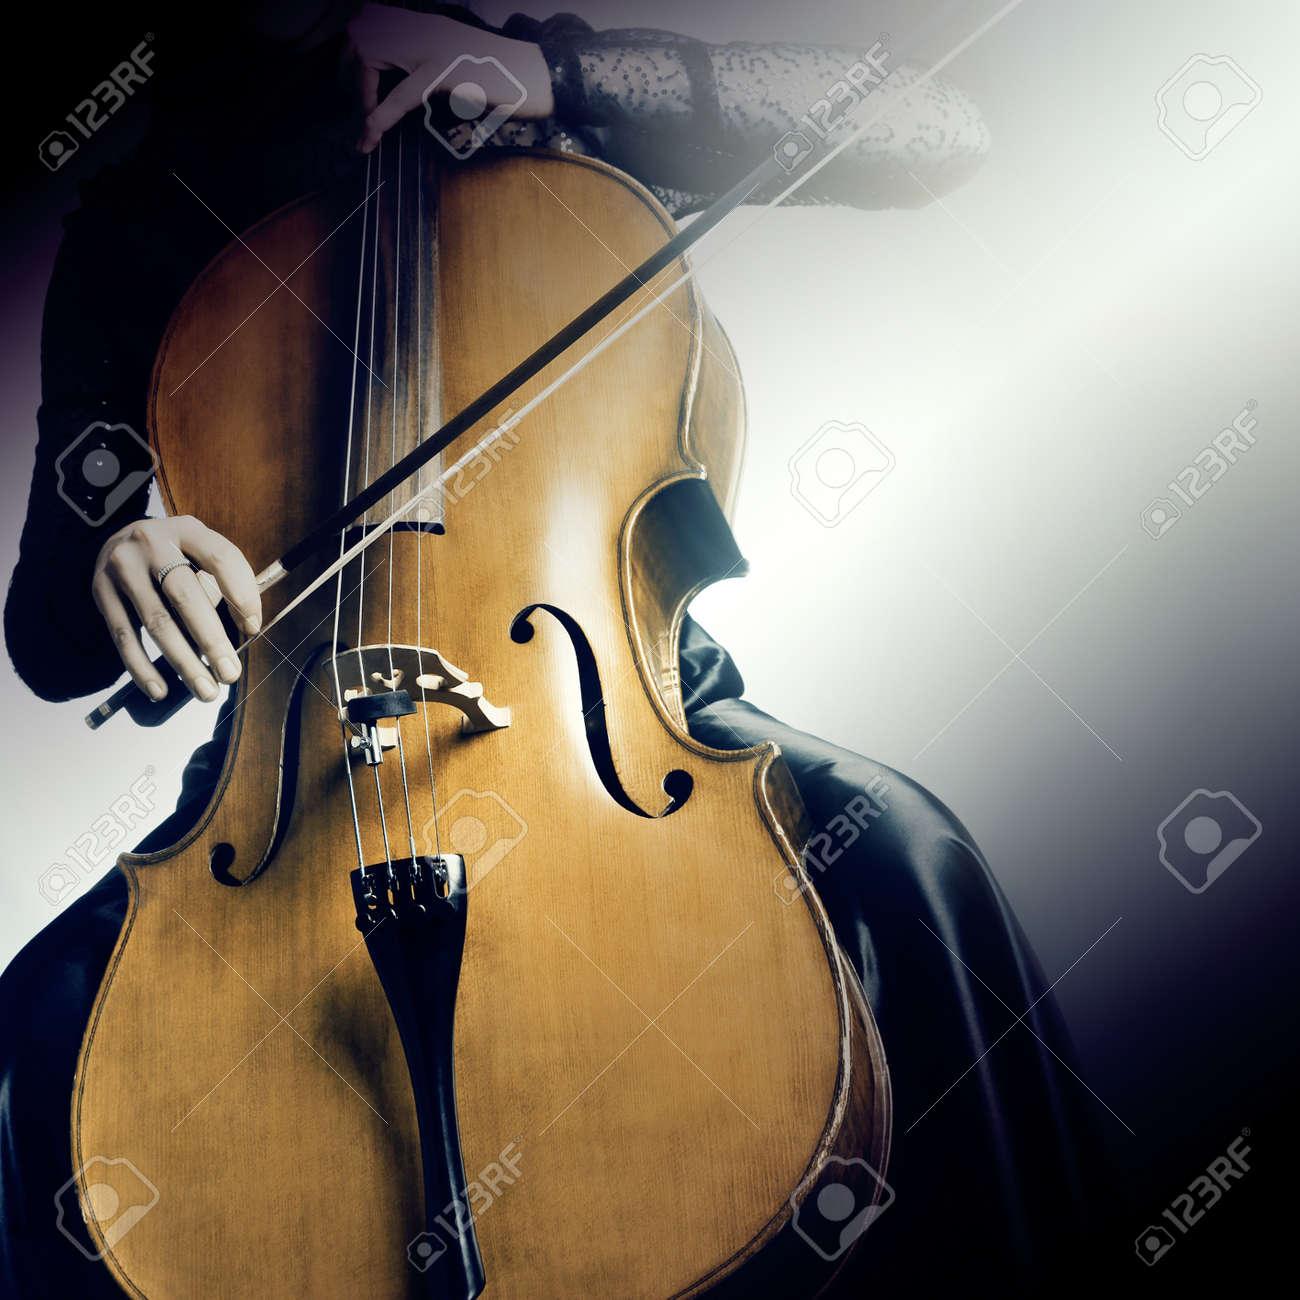 Cello orchestra musical instruments Standard-Bild - 19664239